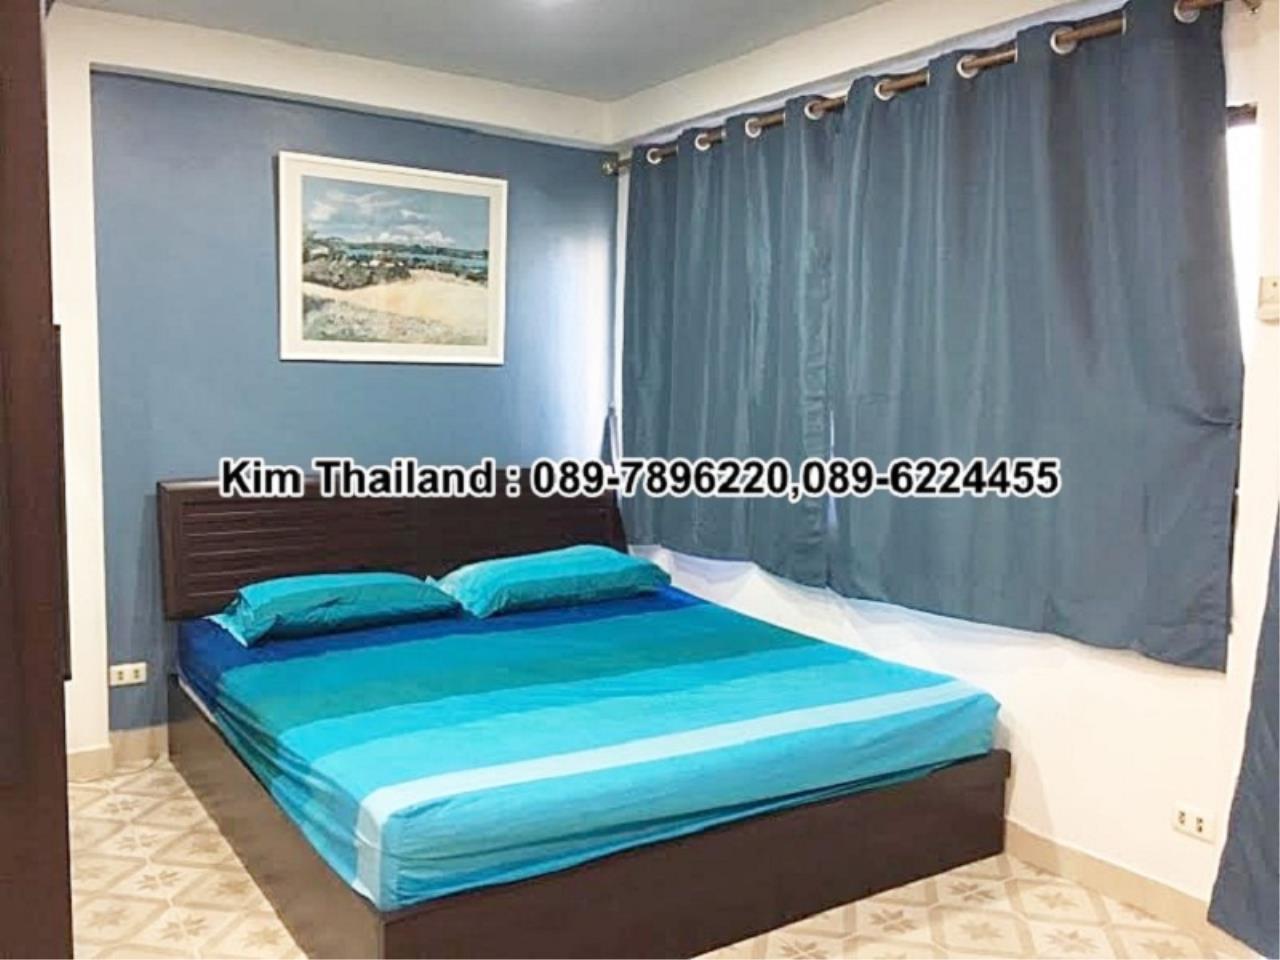 BKKcondorental Agency's For rent, Condo Saranjai Mansion. Area 35 sq.m. Studio. Rent 16,000baht/month 5